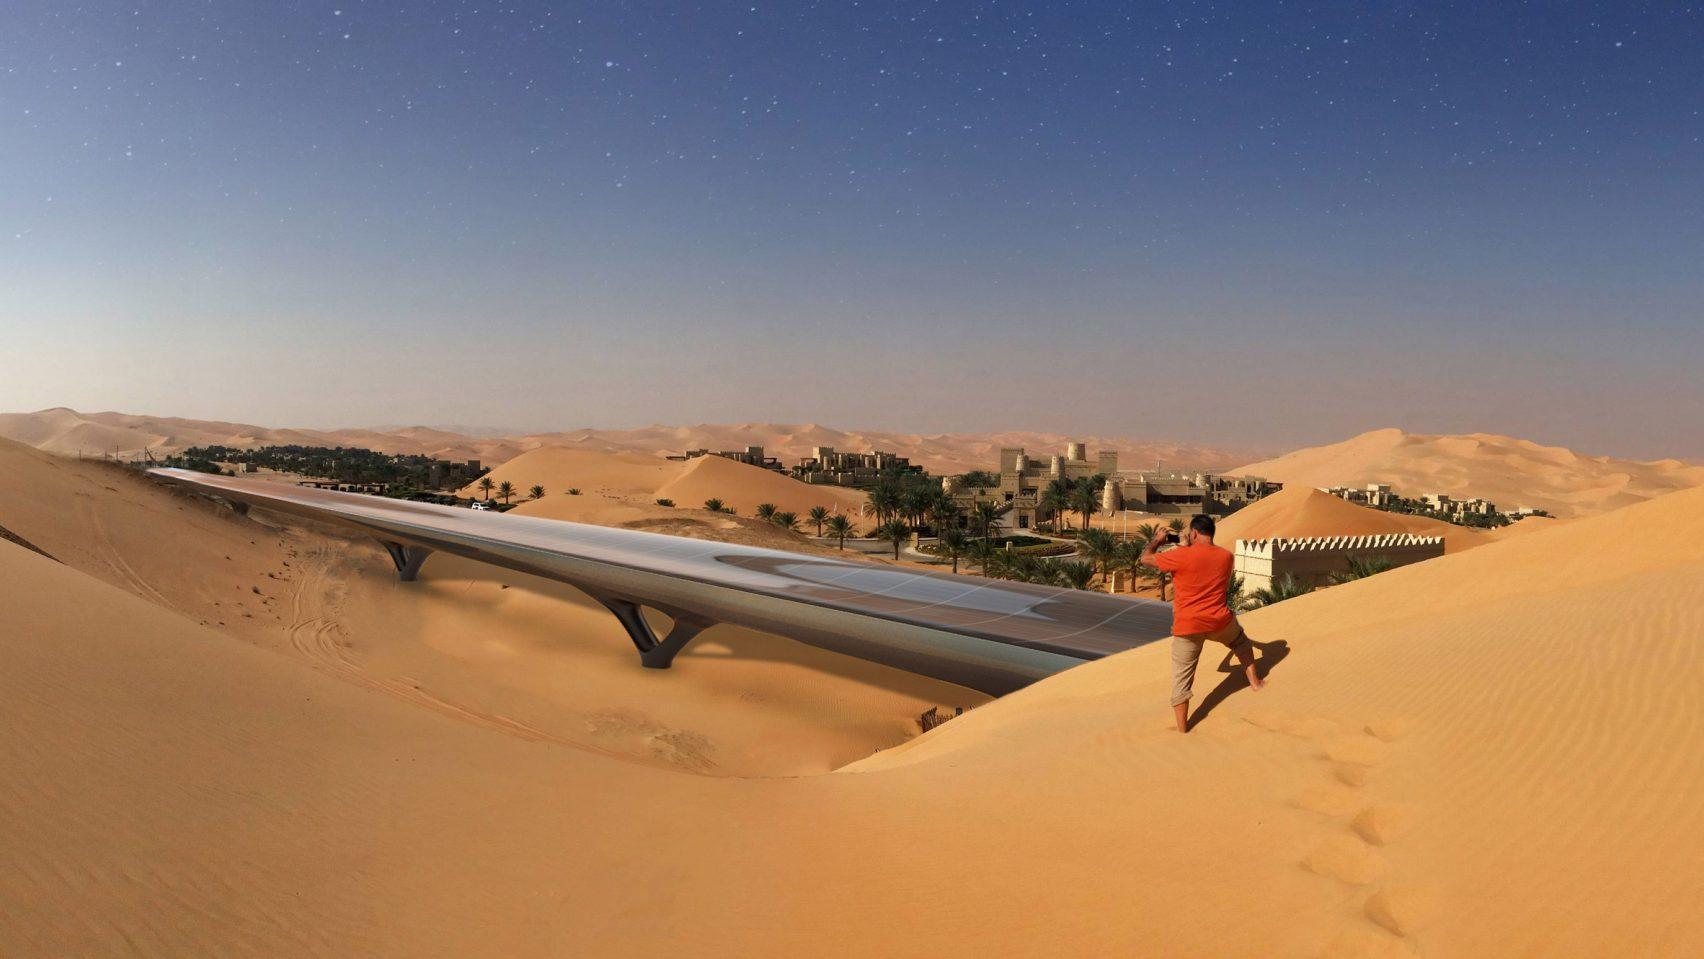 Virgin Hyperloop: The Future of Middle East Transportation?